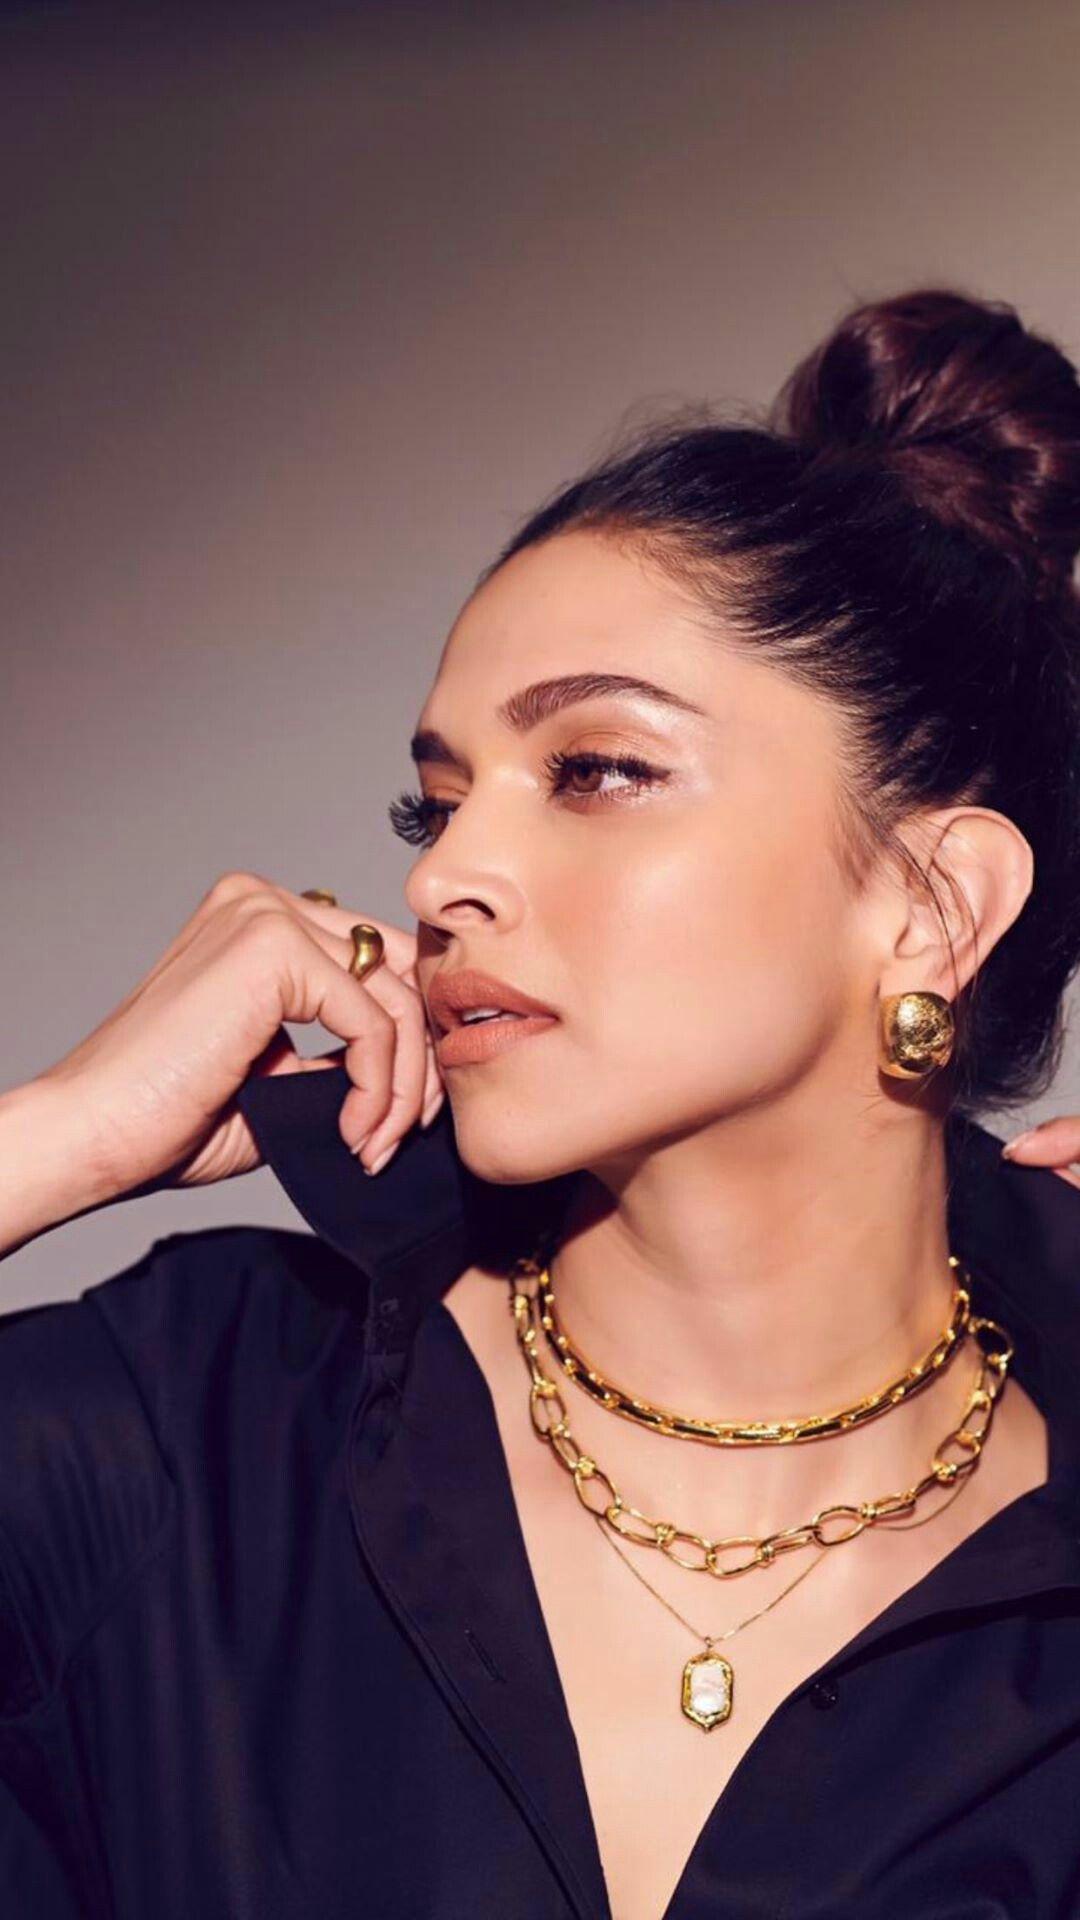 RK🔥🔥 (With images) | Deepika padukone style, Deepika ...